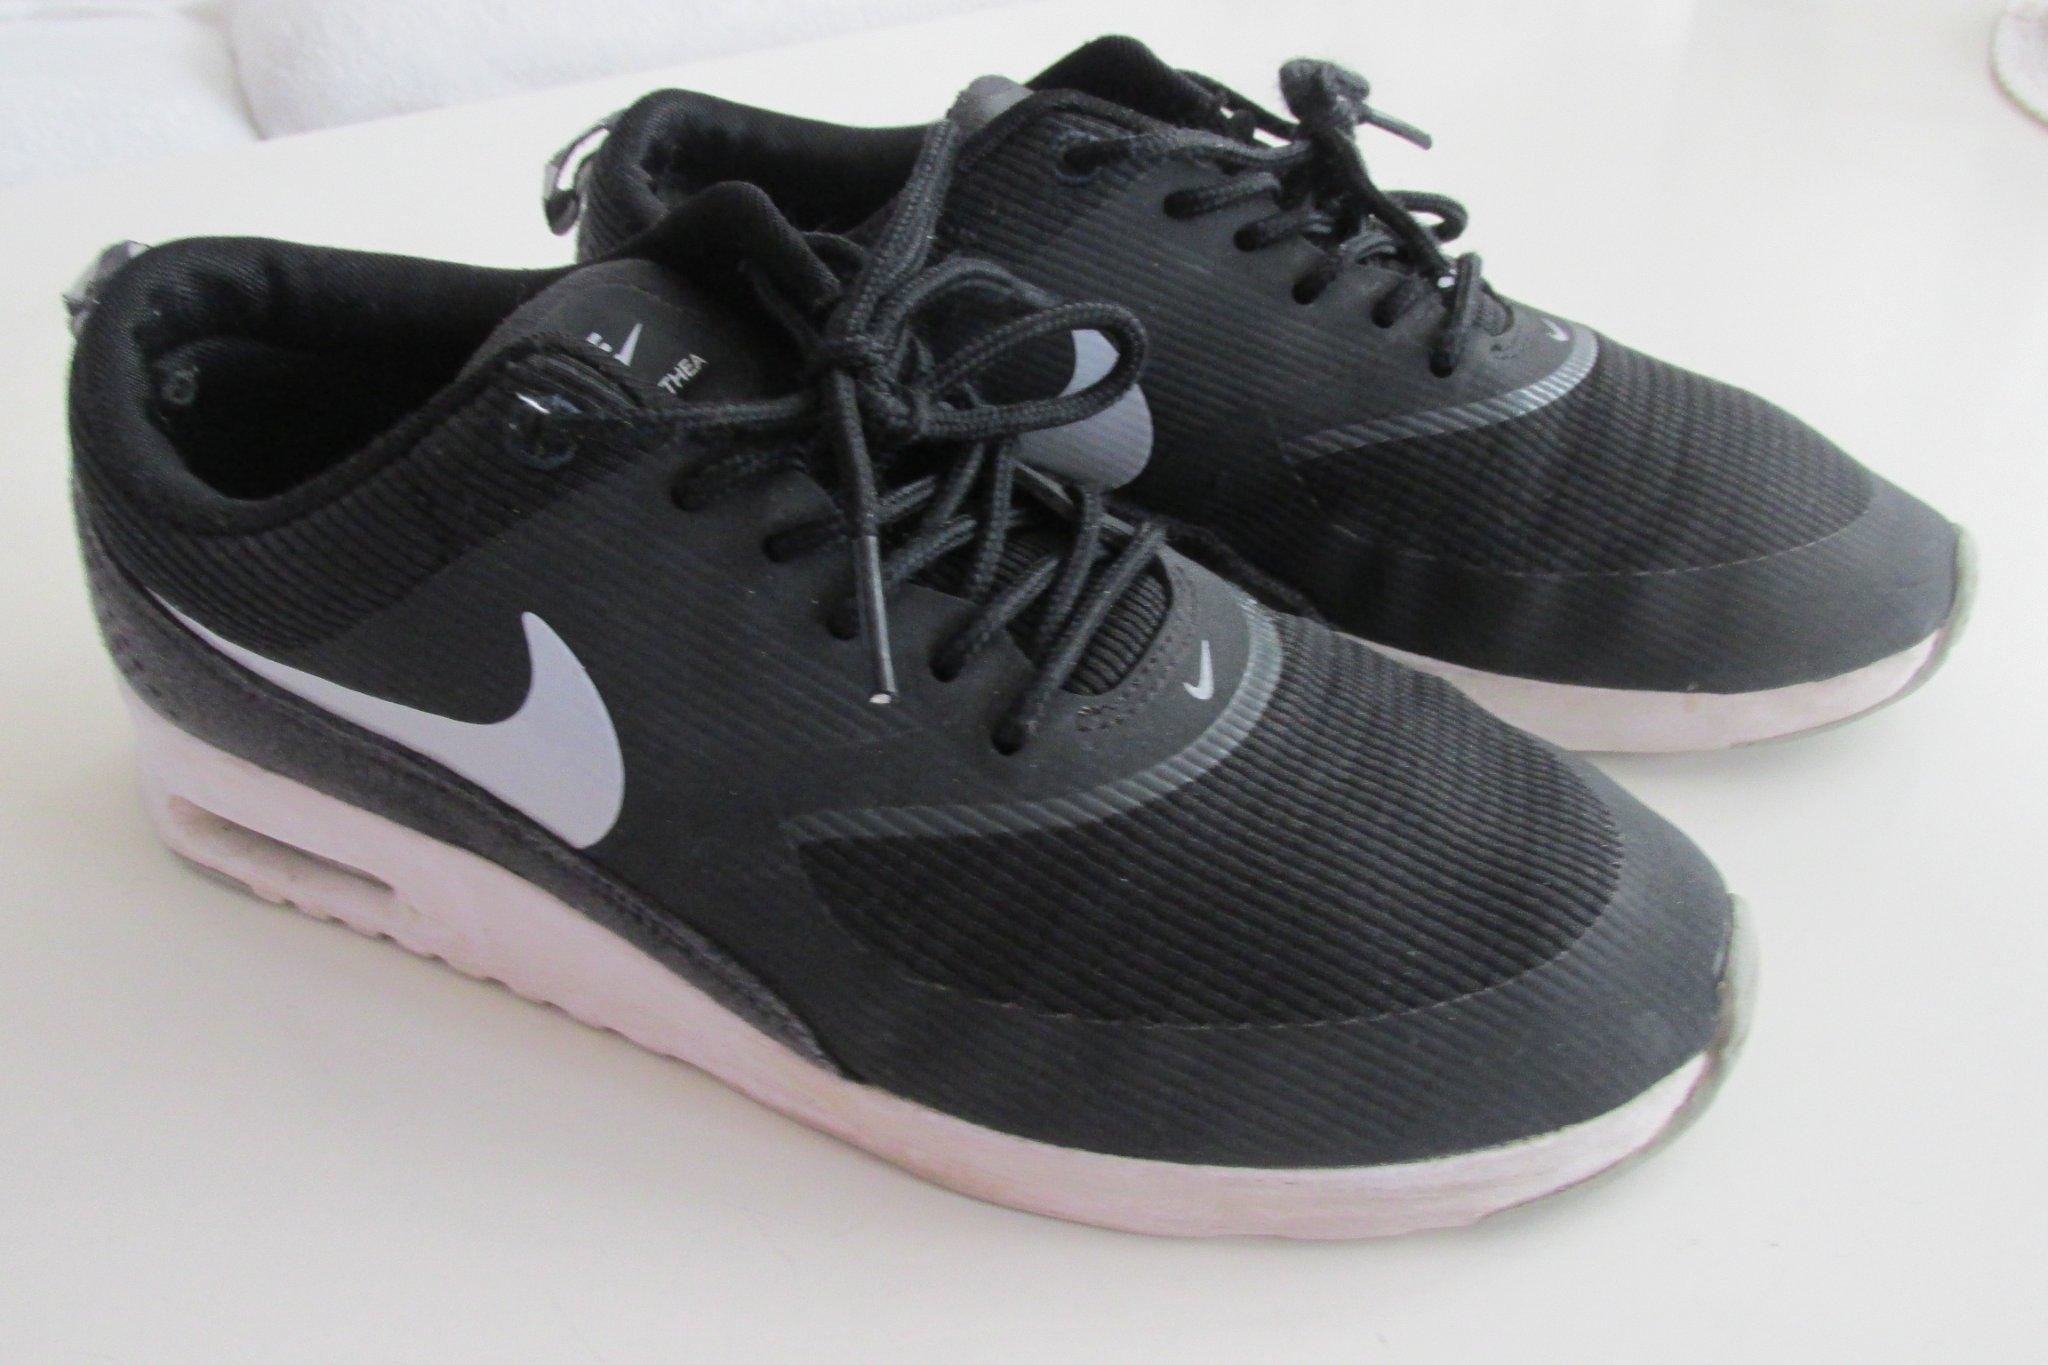 Nike AIR MAX THEA sneakers Vit & svart